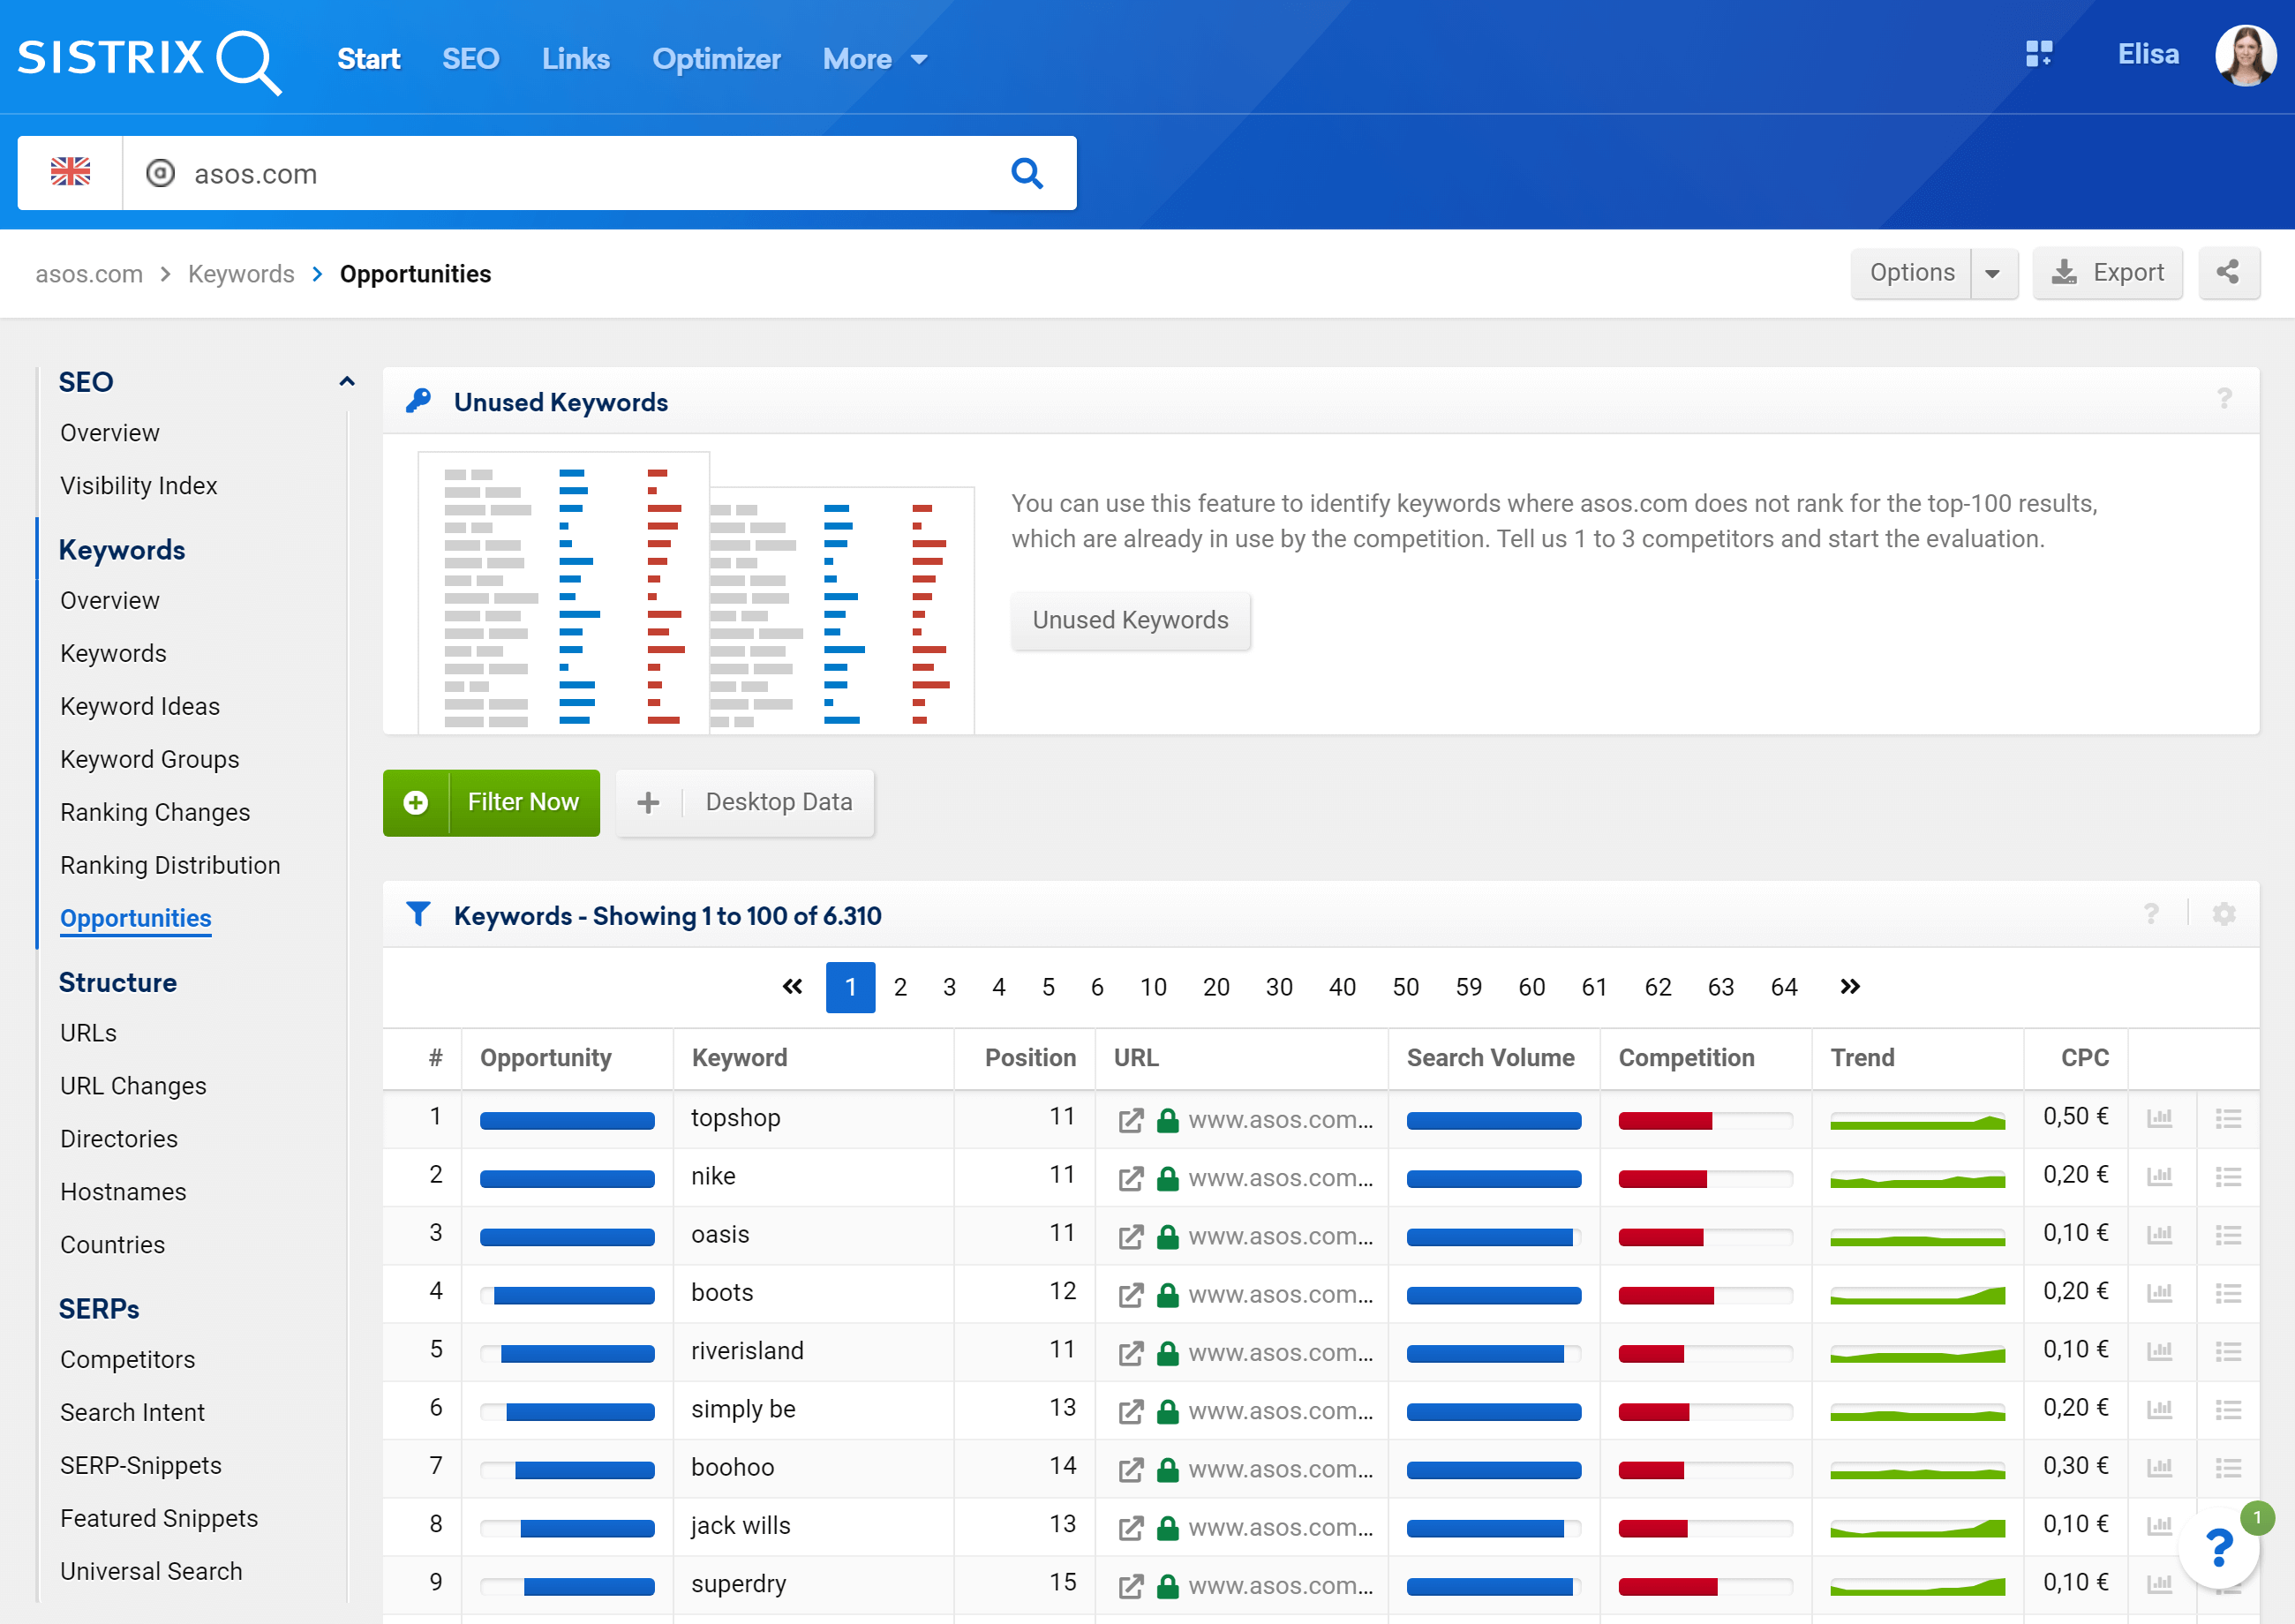 SISTRIX Toolbox: Keyword Opportunities for asos.com